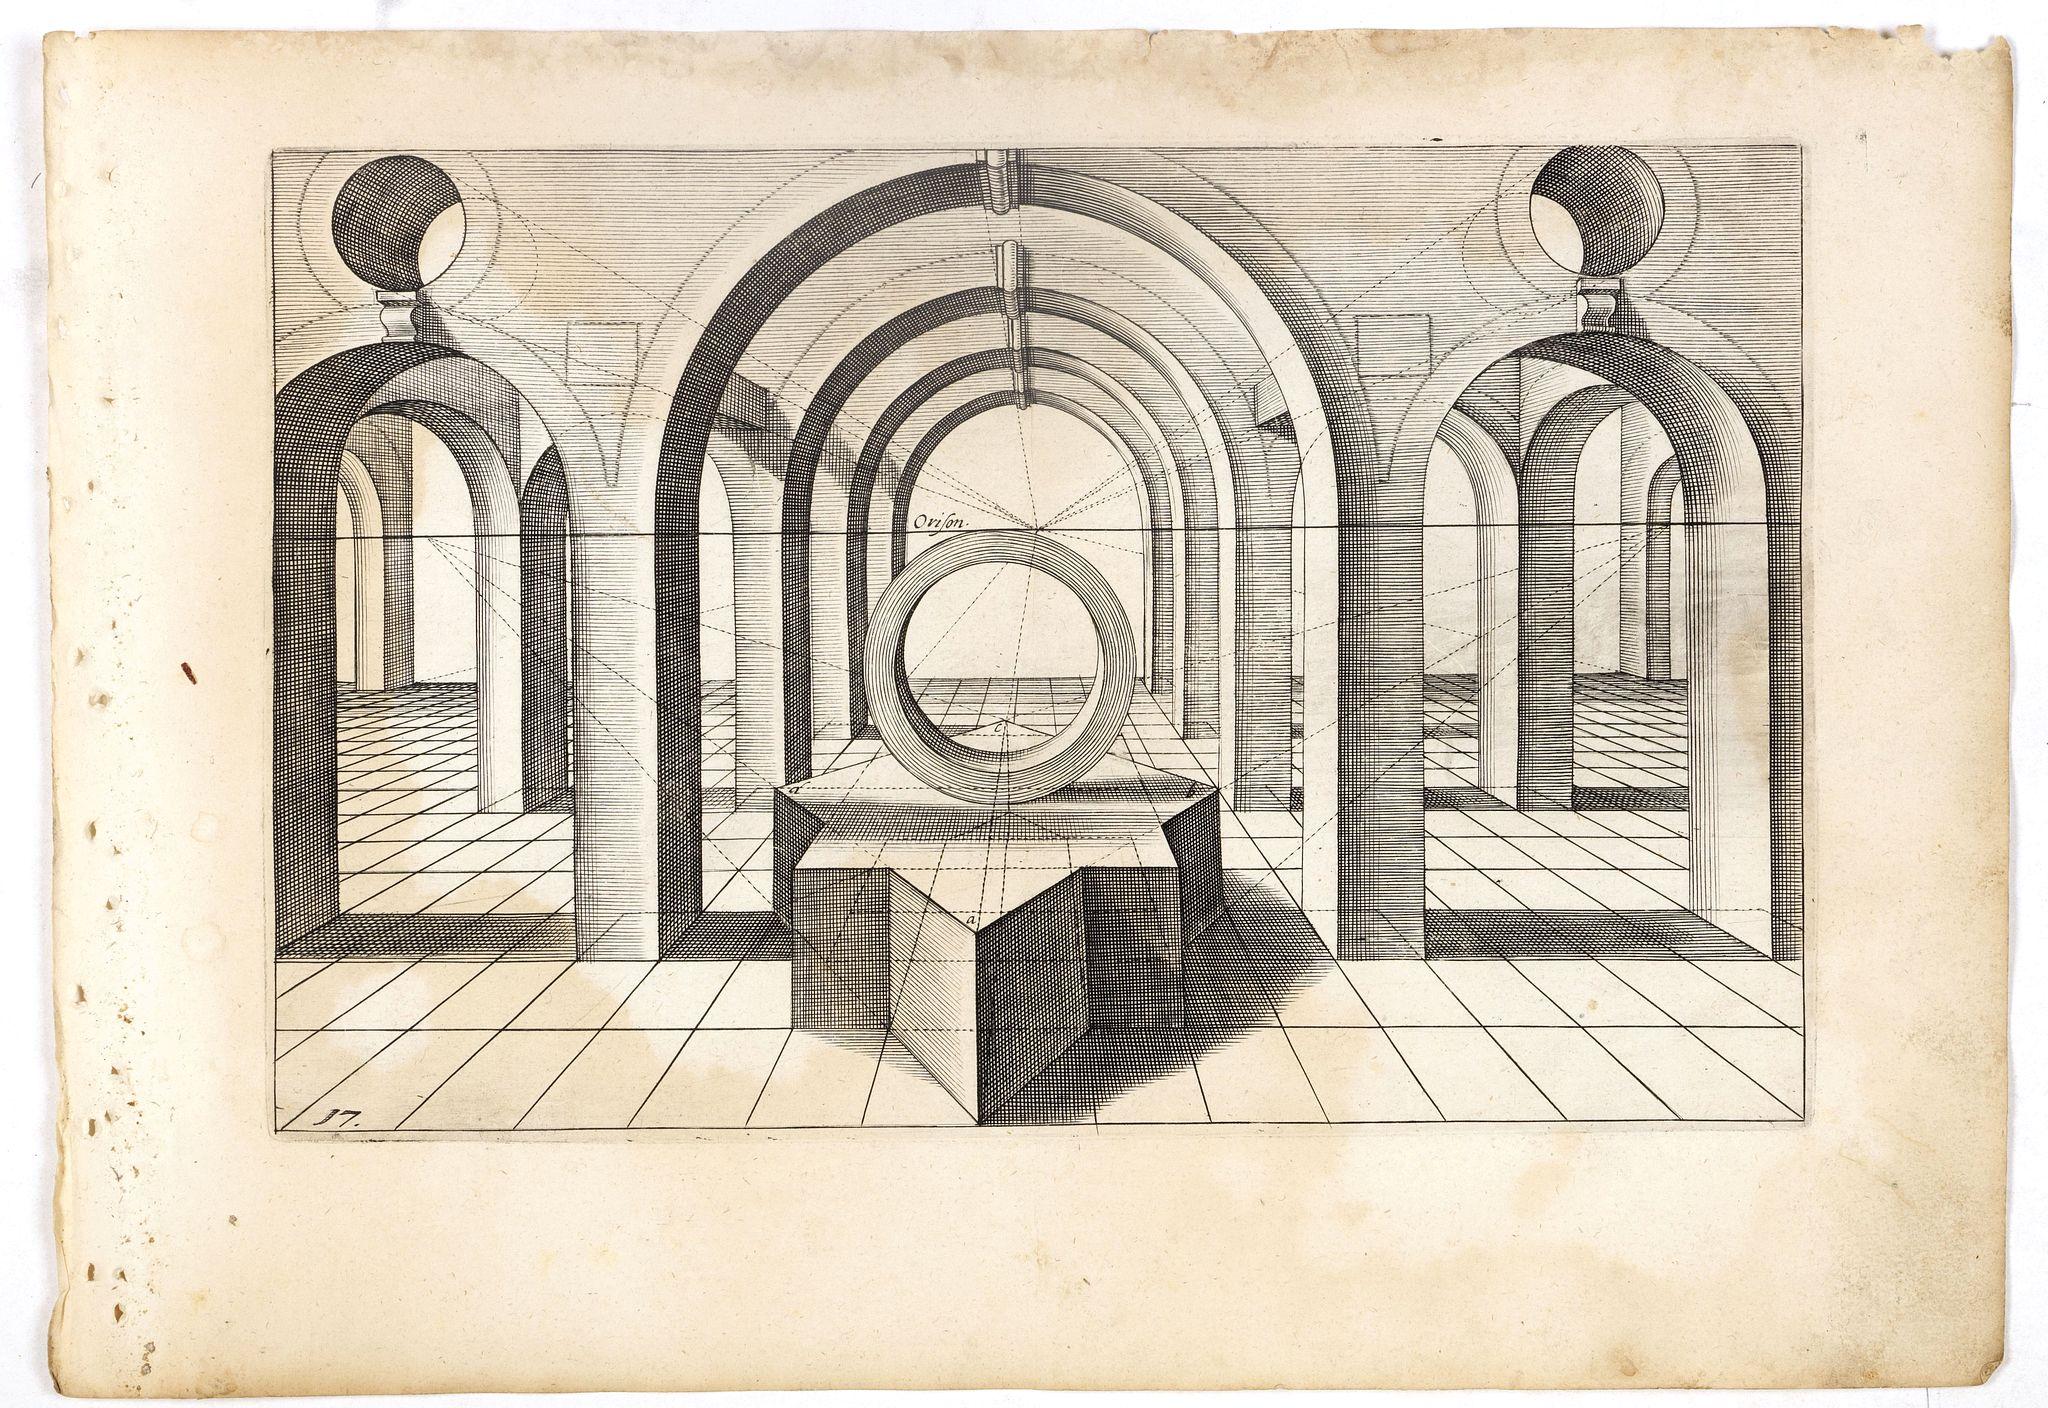 VREDEMAN DE VRIES, J. / HONDIUS, H. -  Perspective print by Vredeman de Vries. 17.